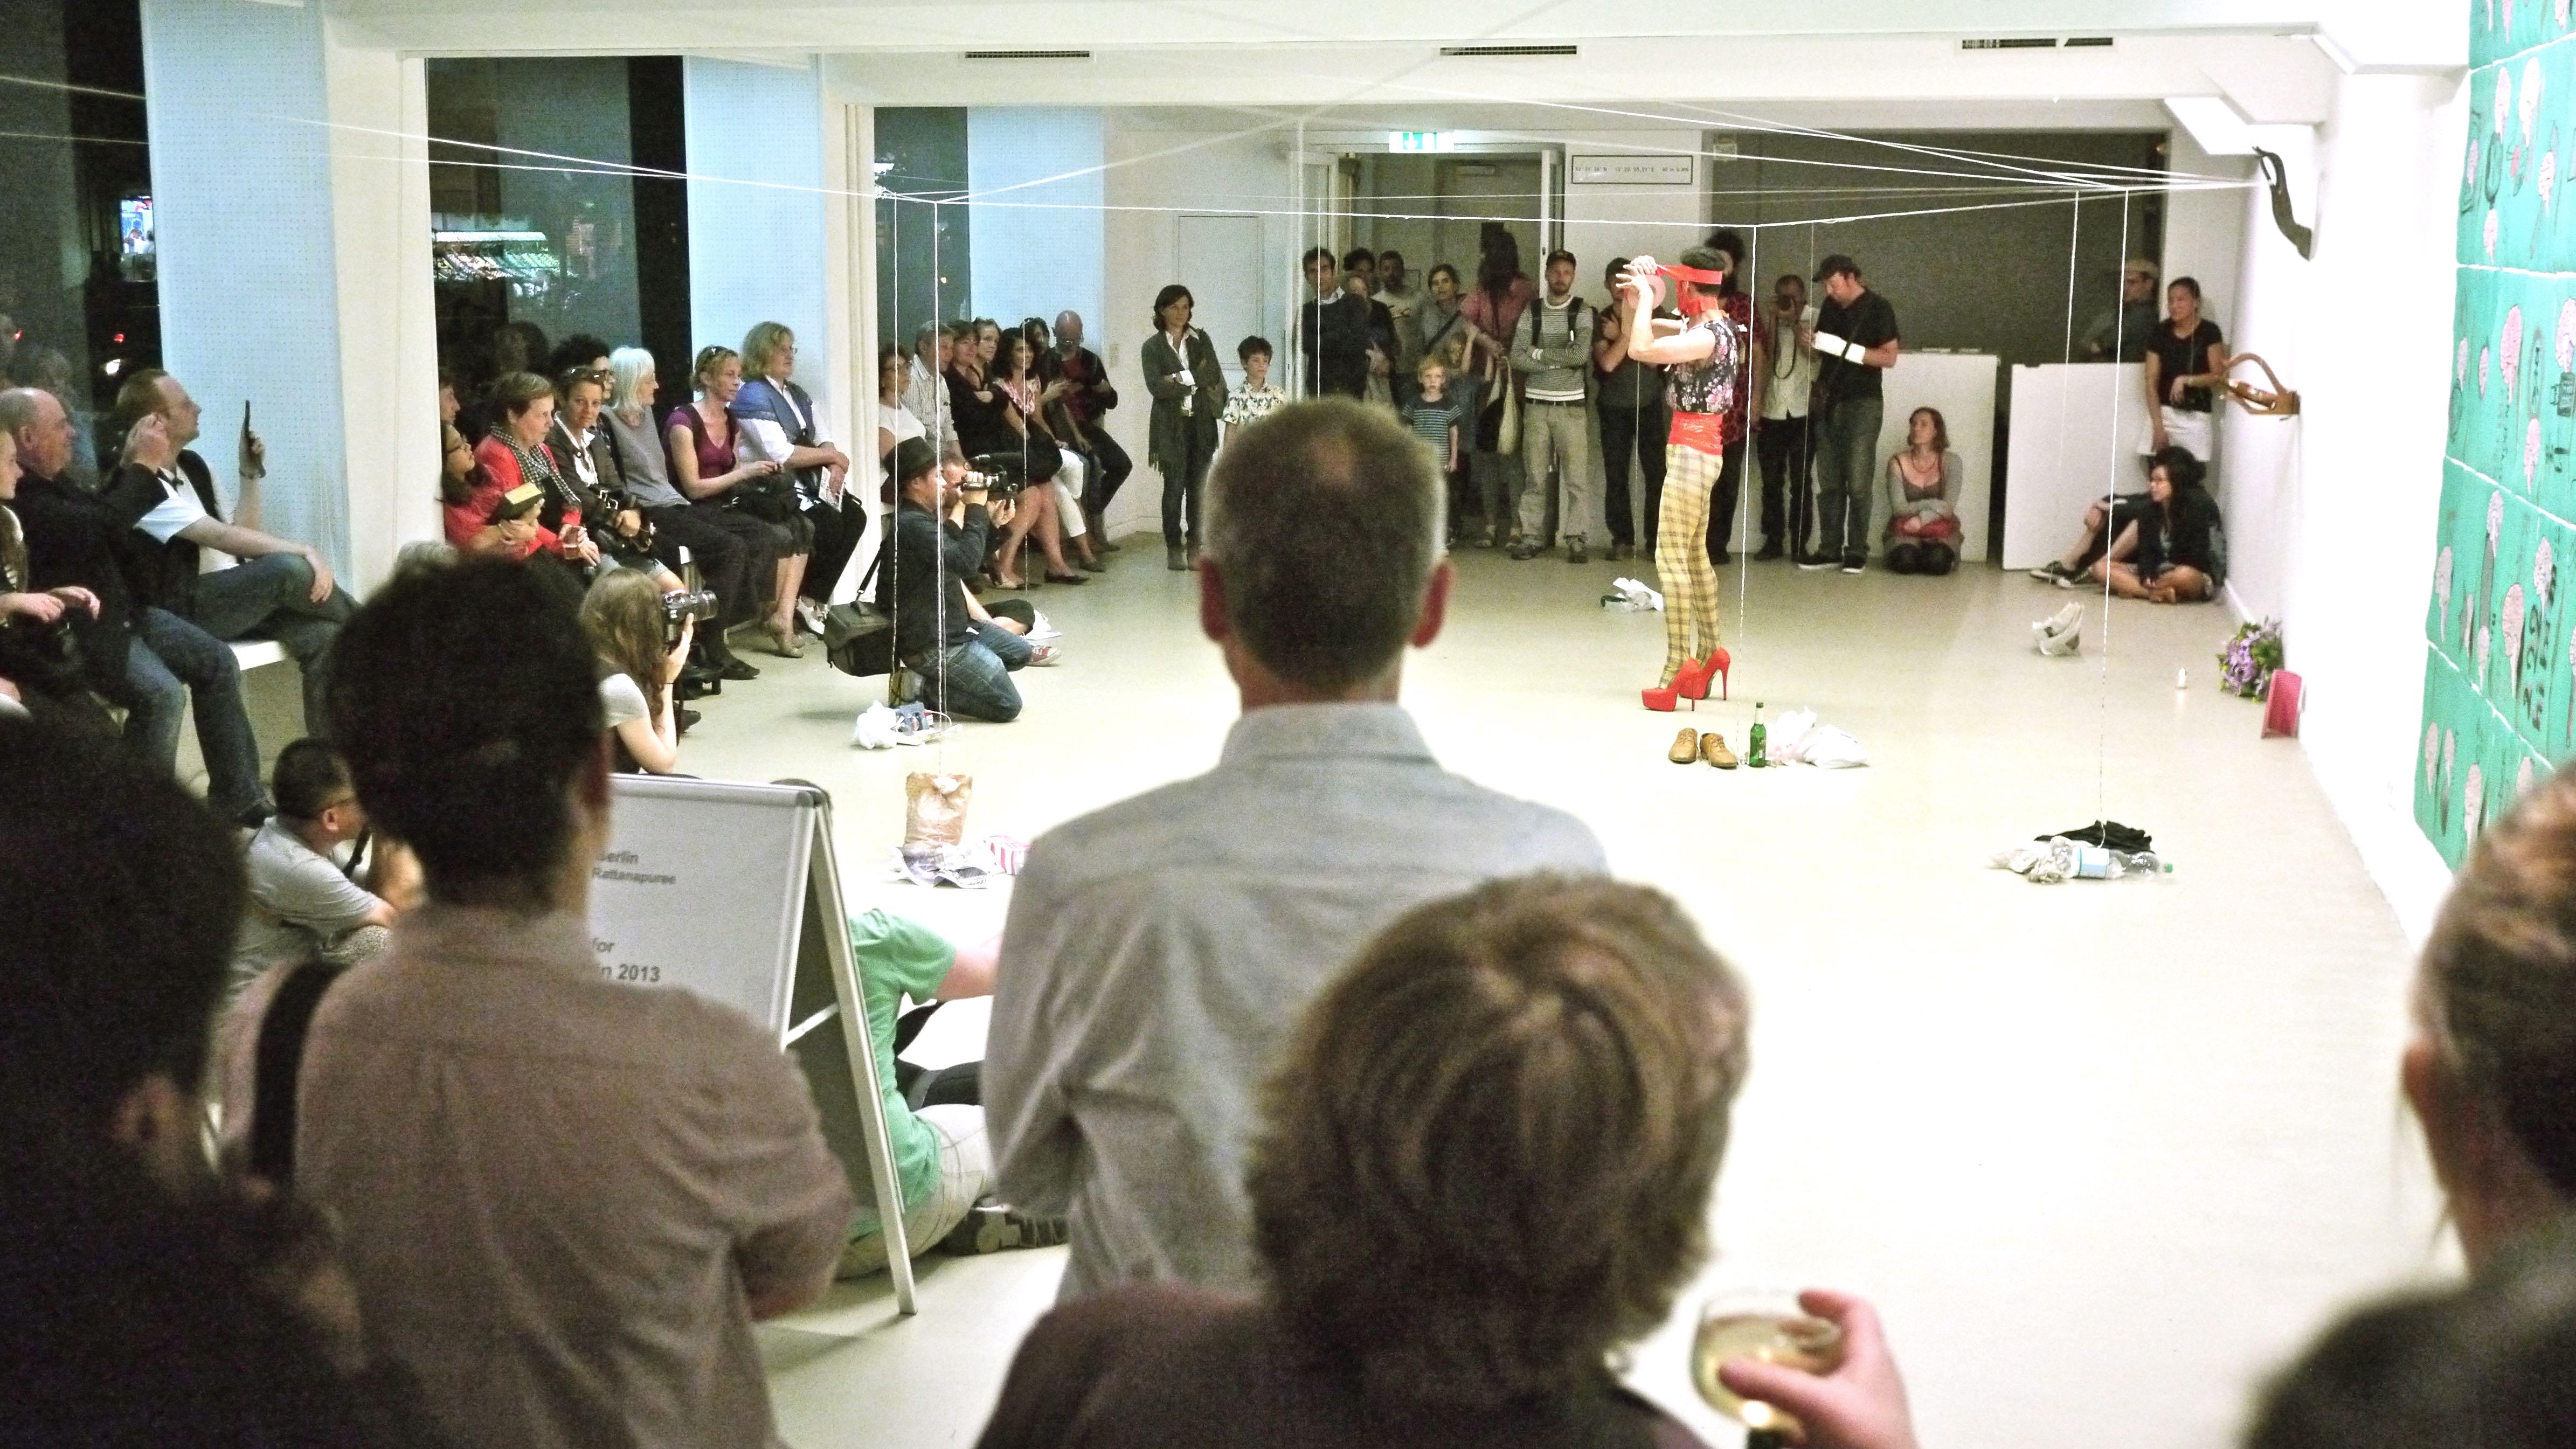 Exotika 2013- Performance SKALL Vernissage / Opening  Kunstverein Tiergarten/Galerie Nord